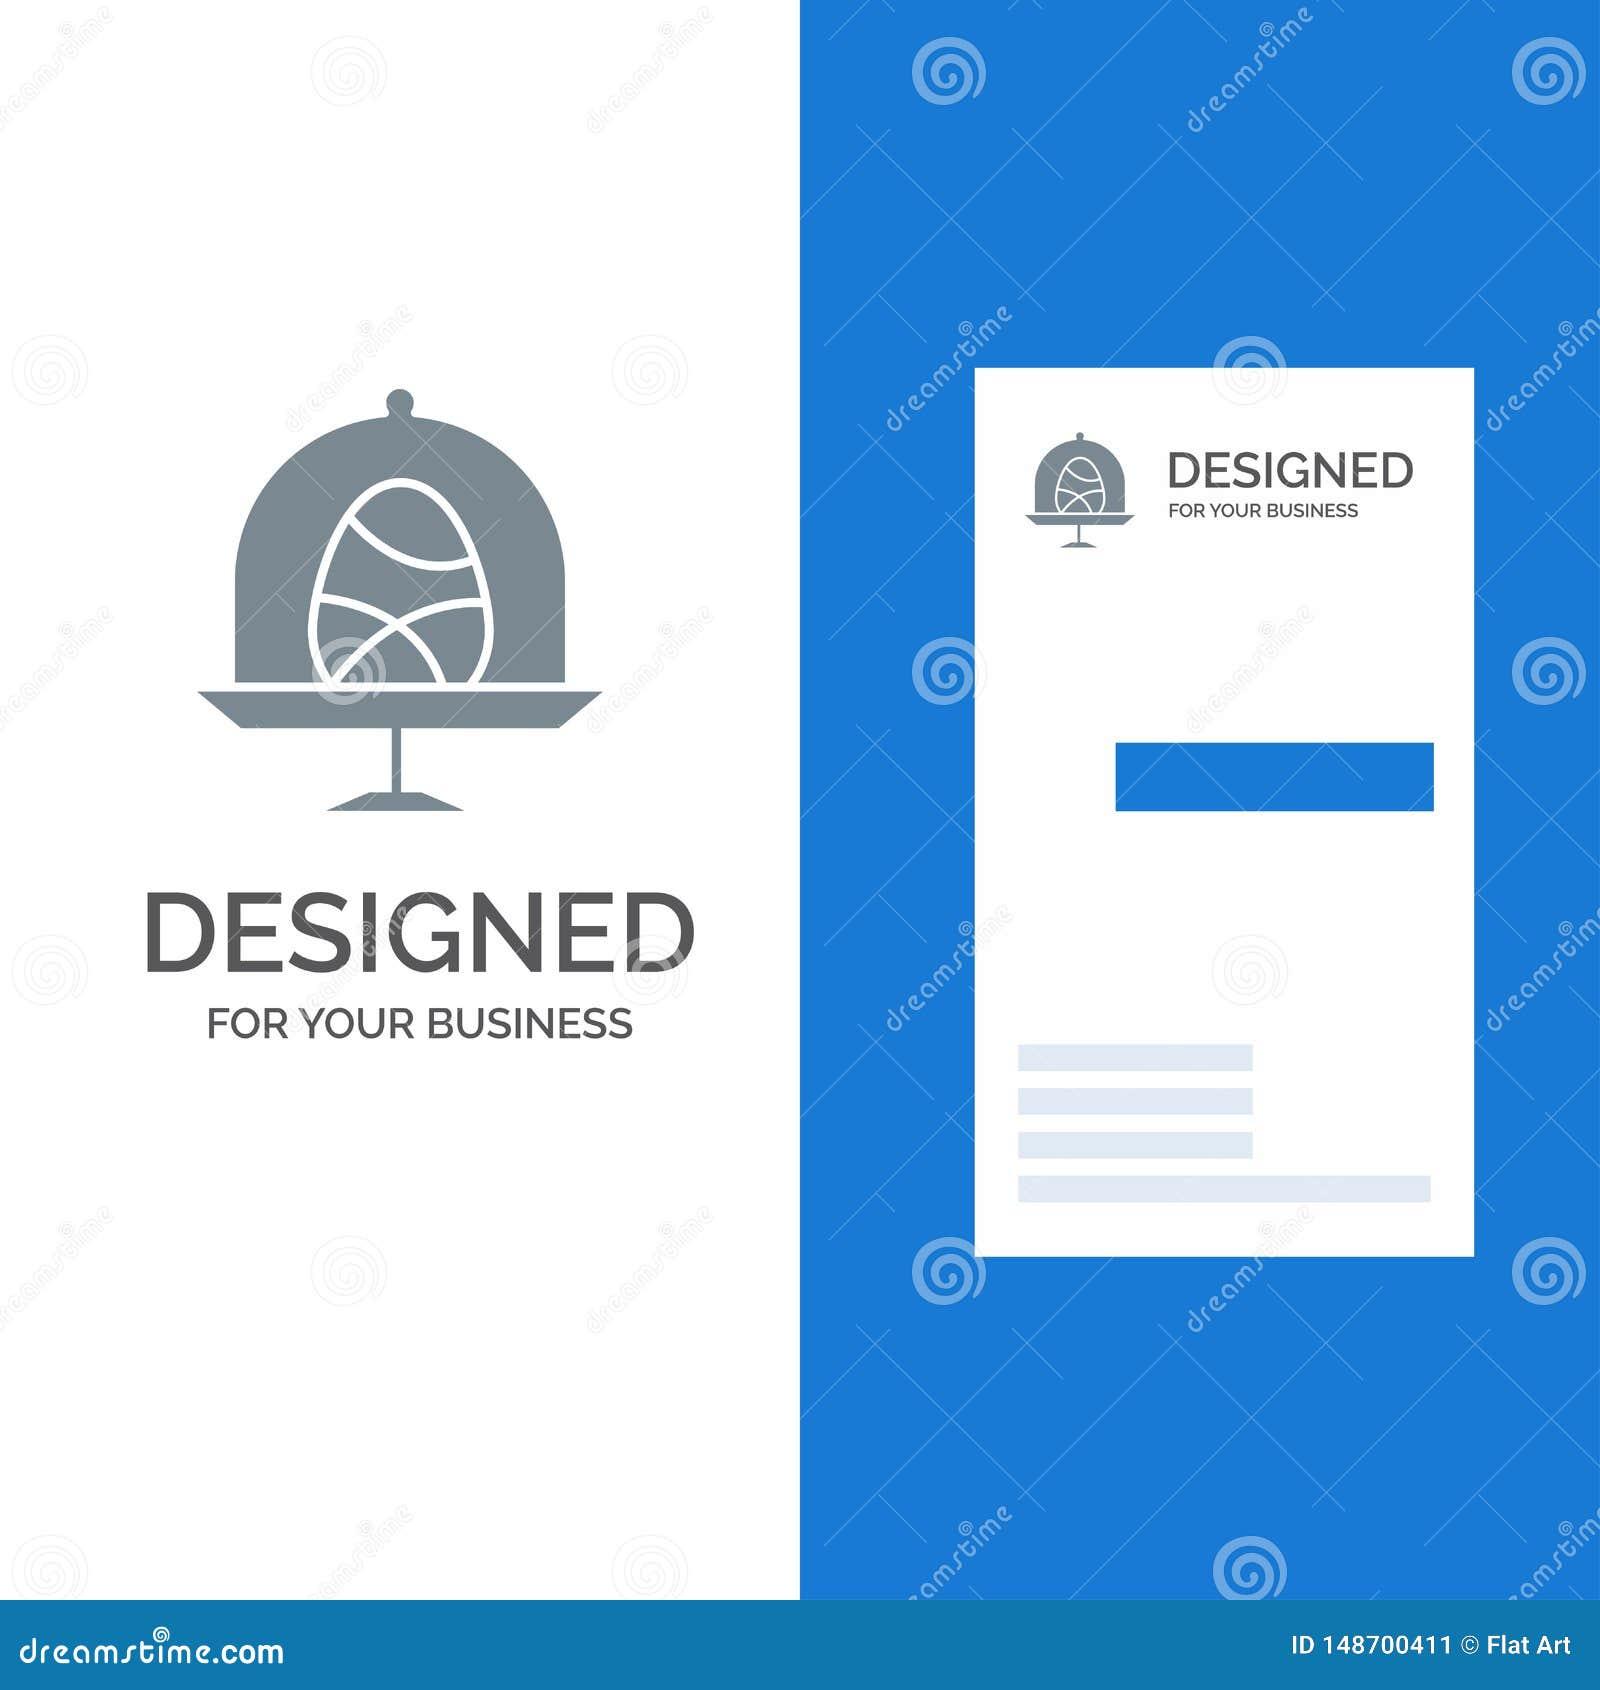 Disk, Egg, Food, Easter Grey Logo Design and Business Card Template